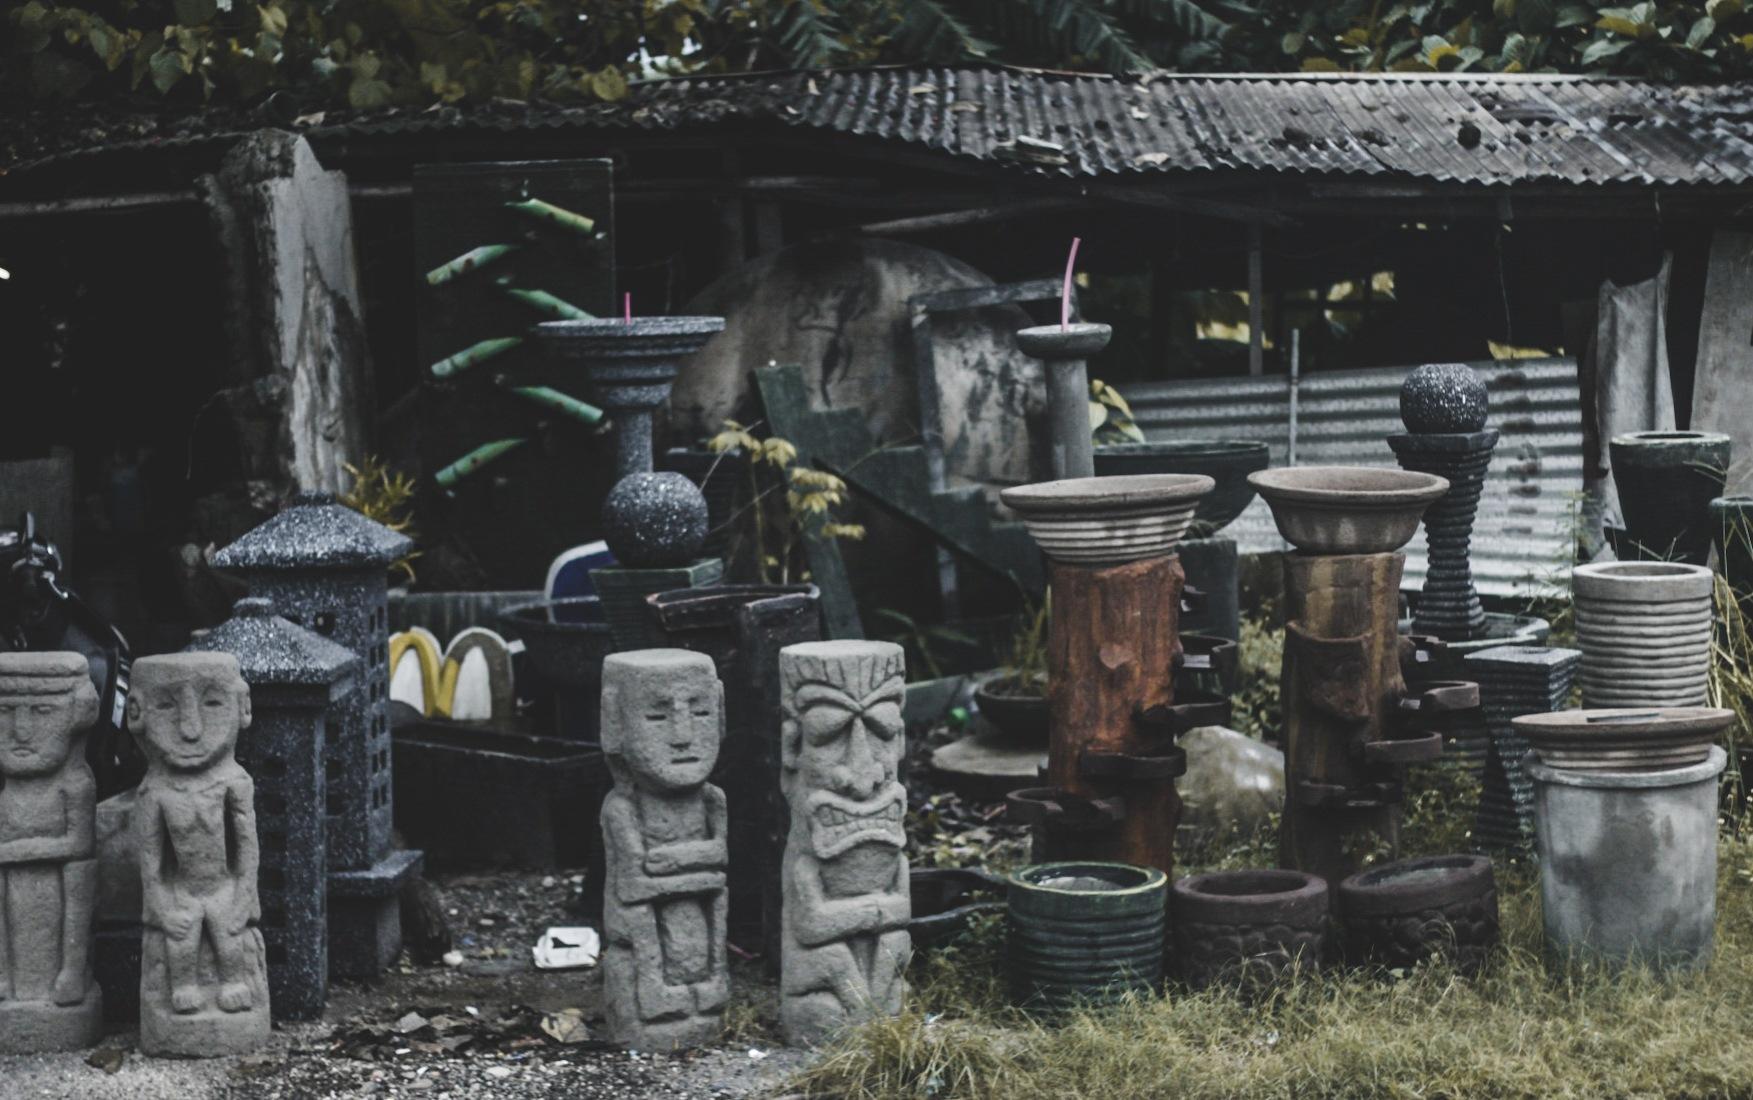 garden statues by Nanteesparts